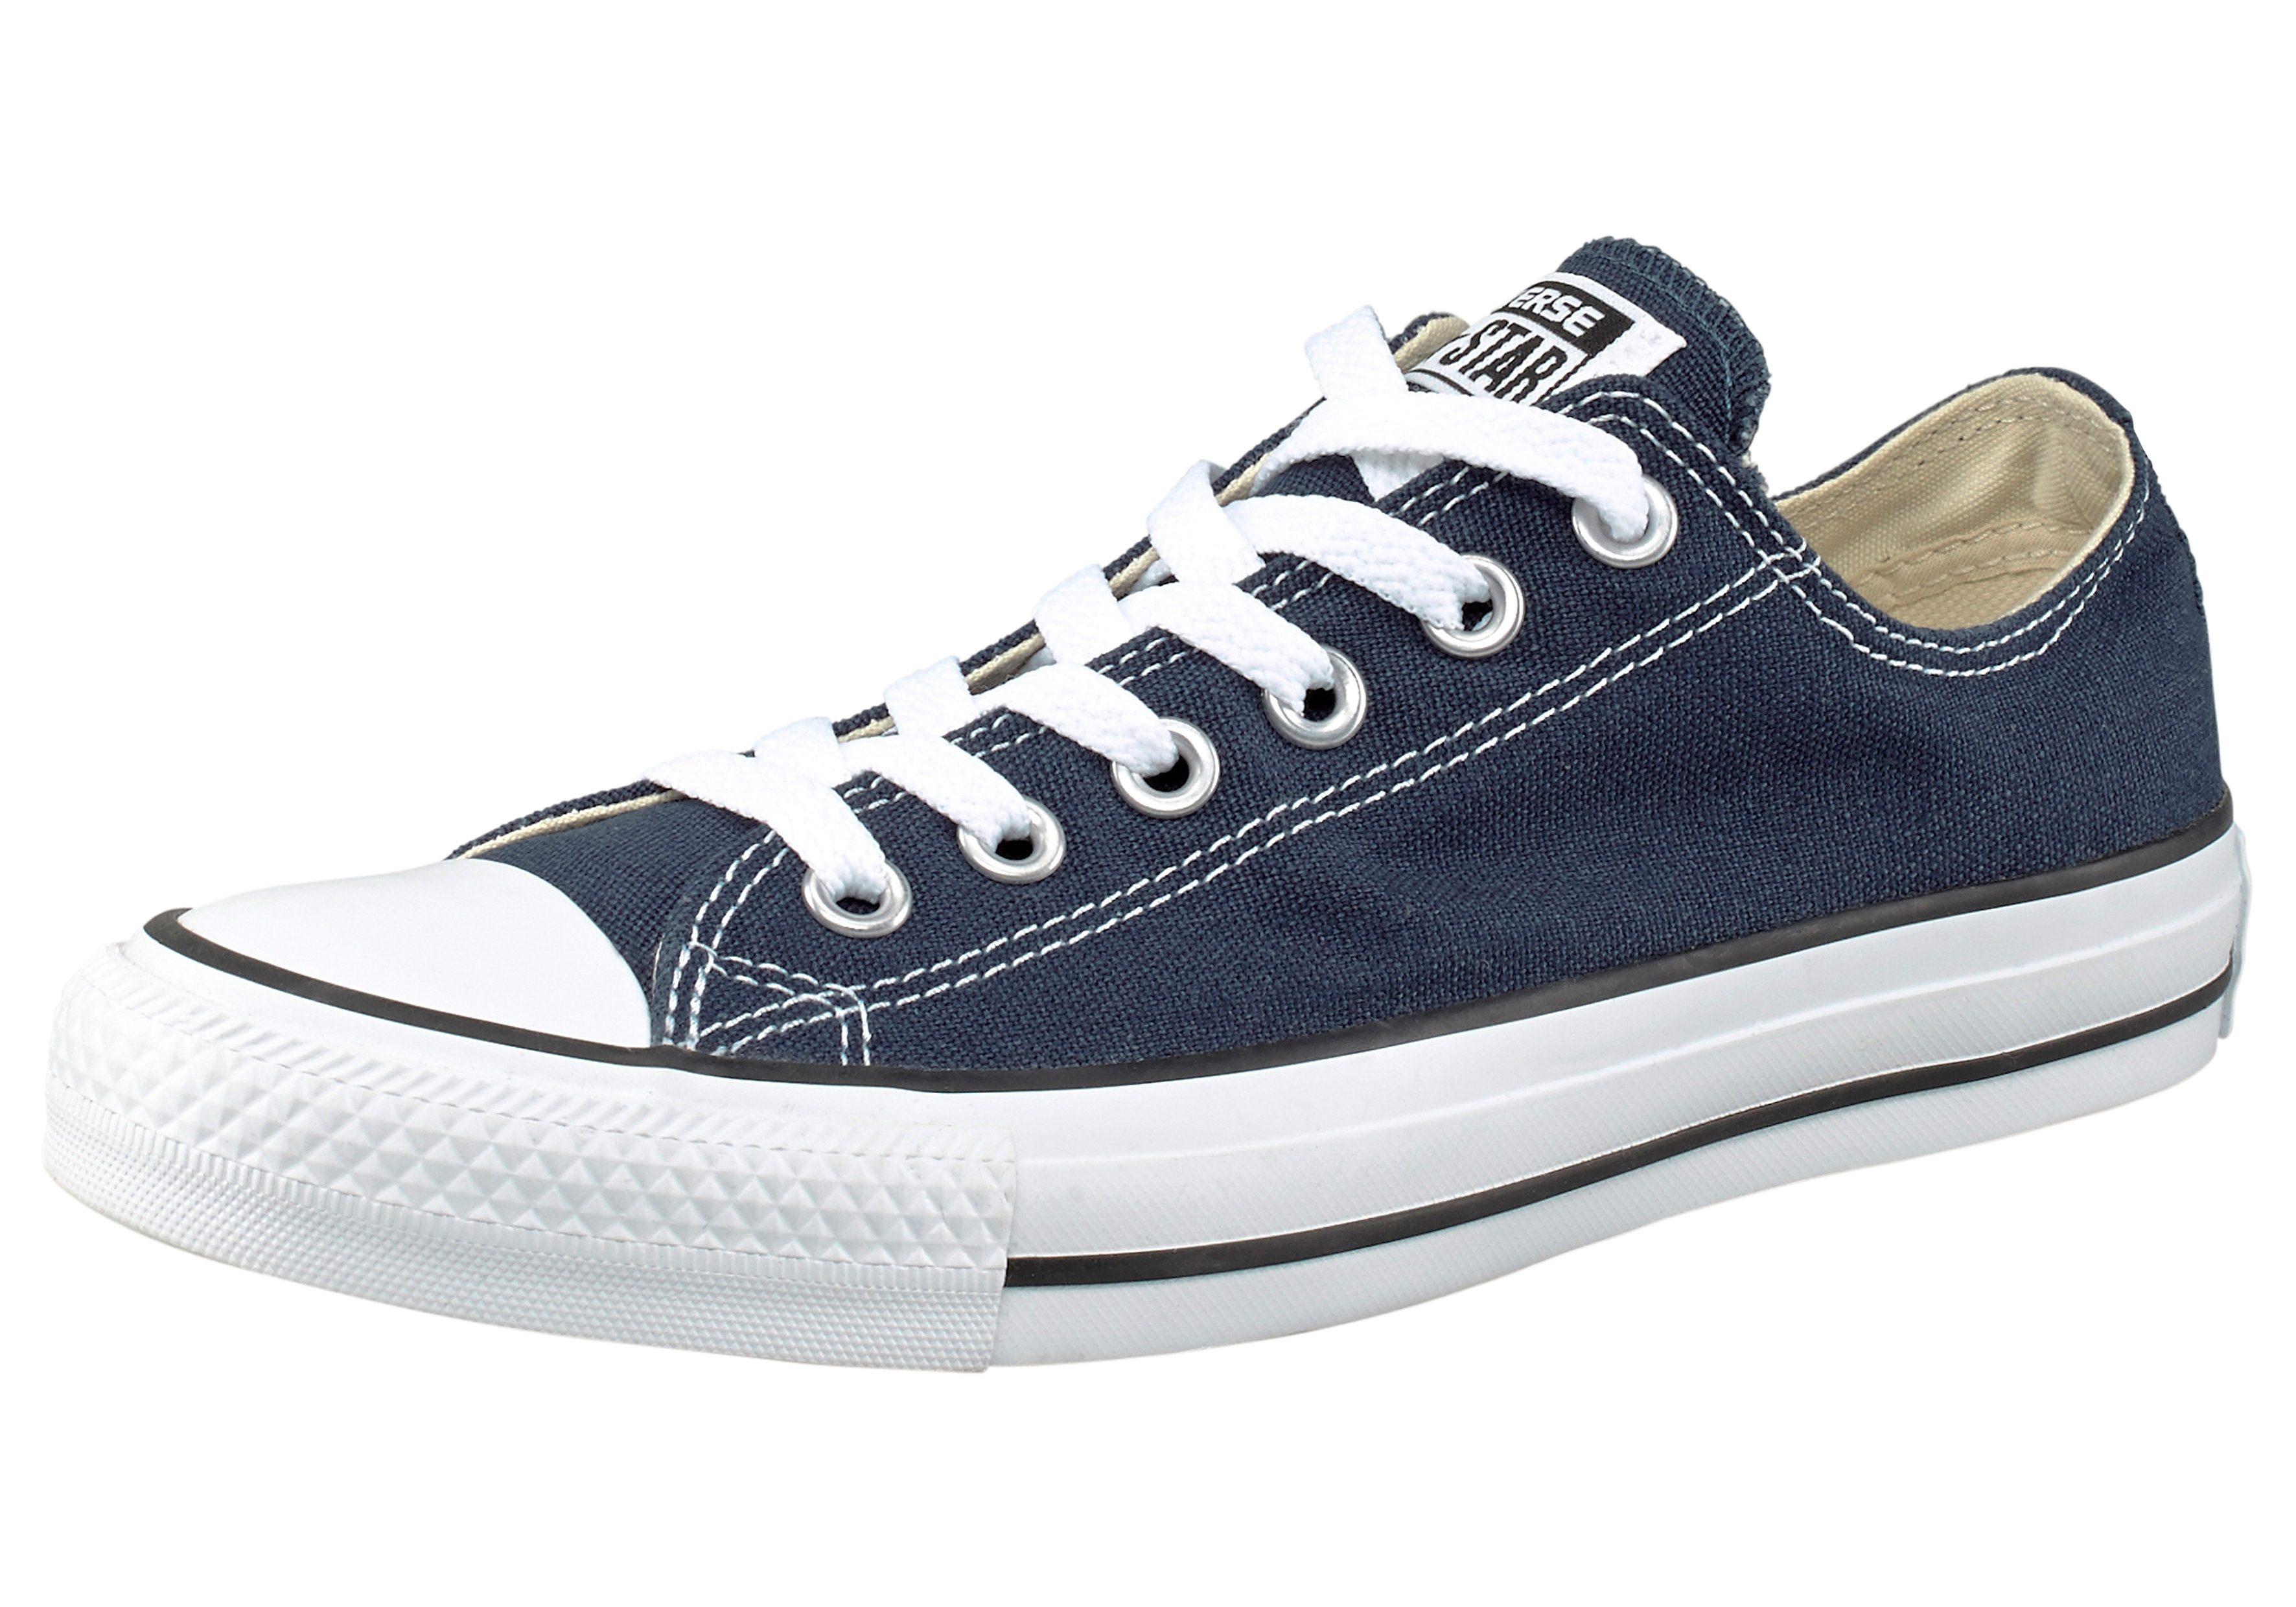 Converse Chuck Taylor All Star Core Ox Sneaker  marine